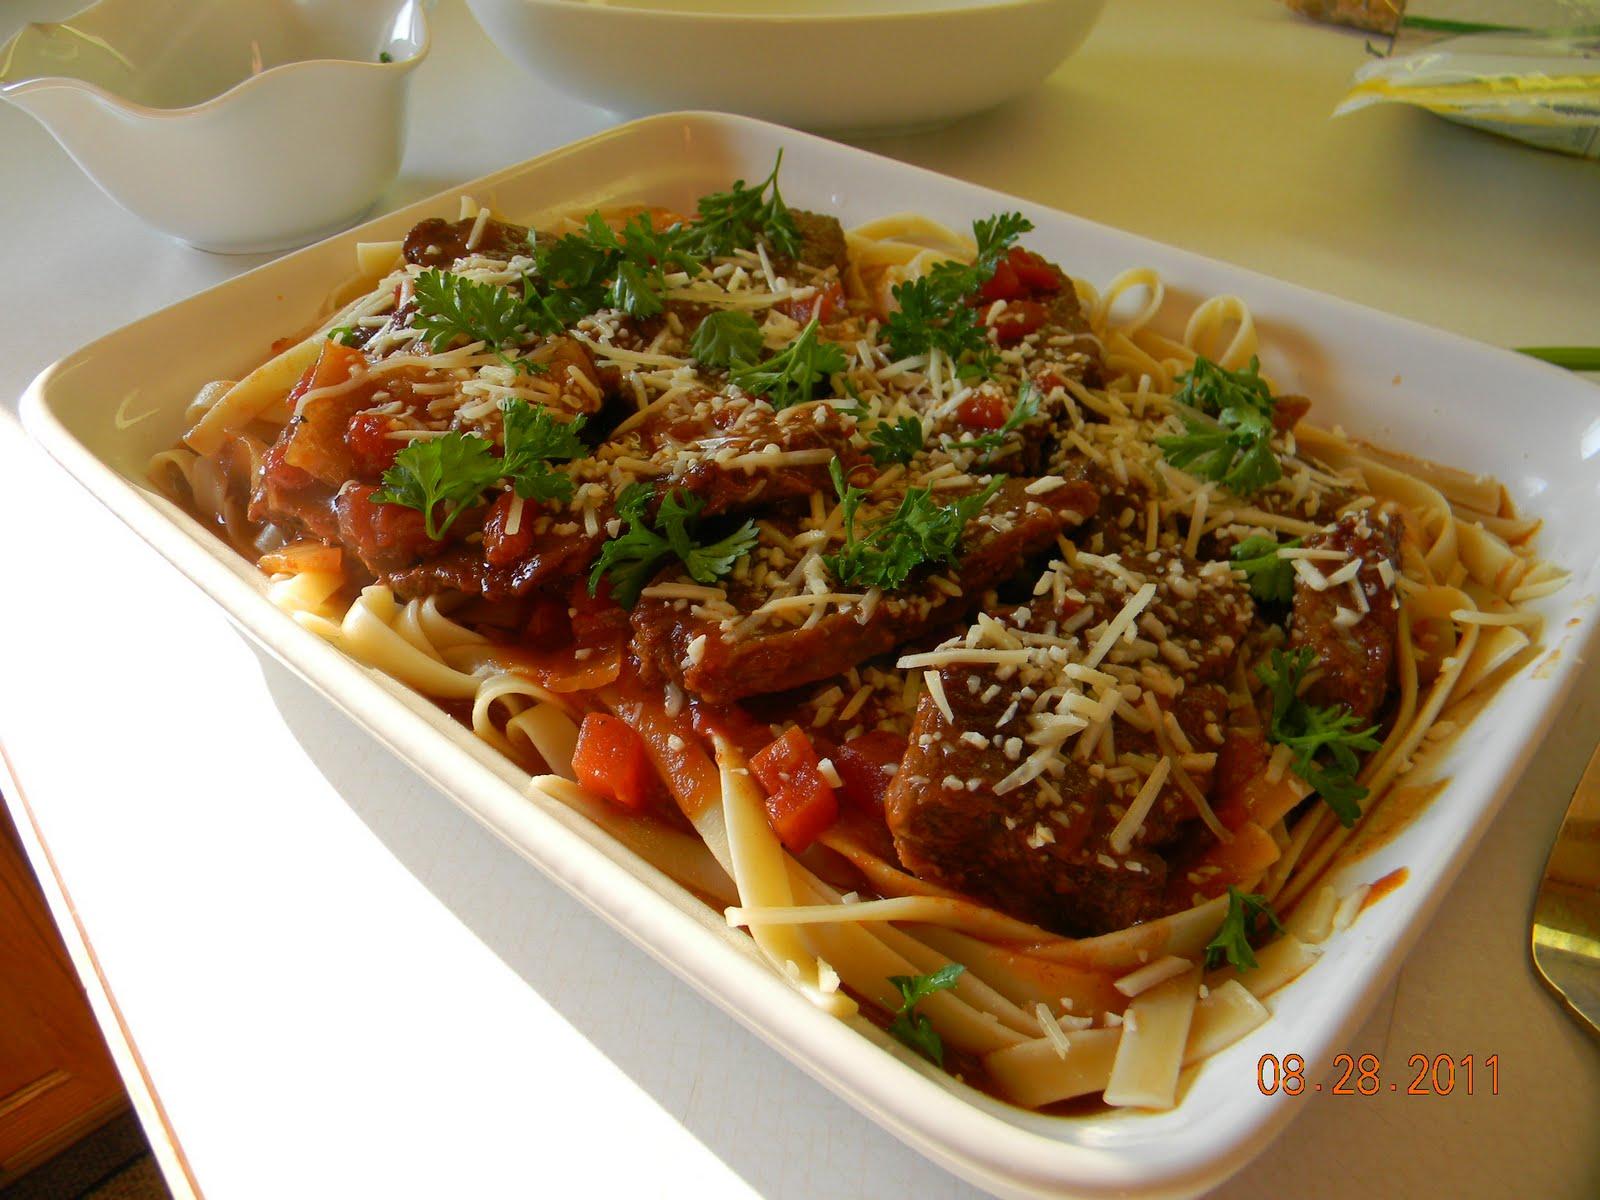 Simply Delicious Everyday: Recipe: Boneless Short Ribs in Tomato Sauce